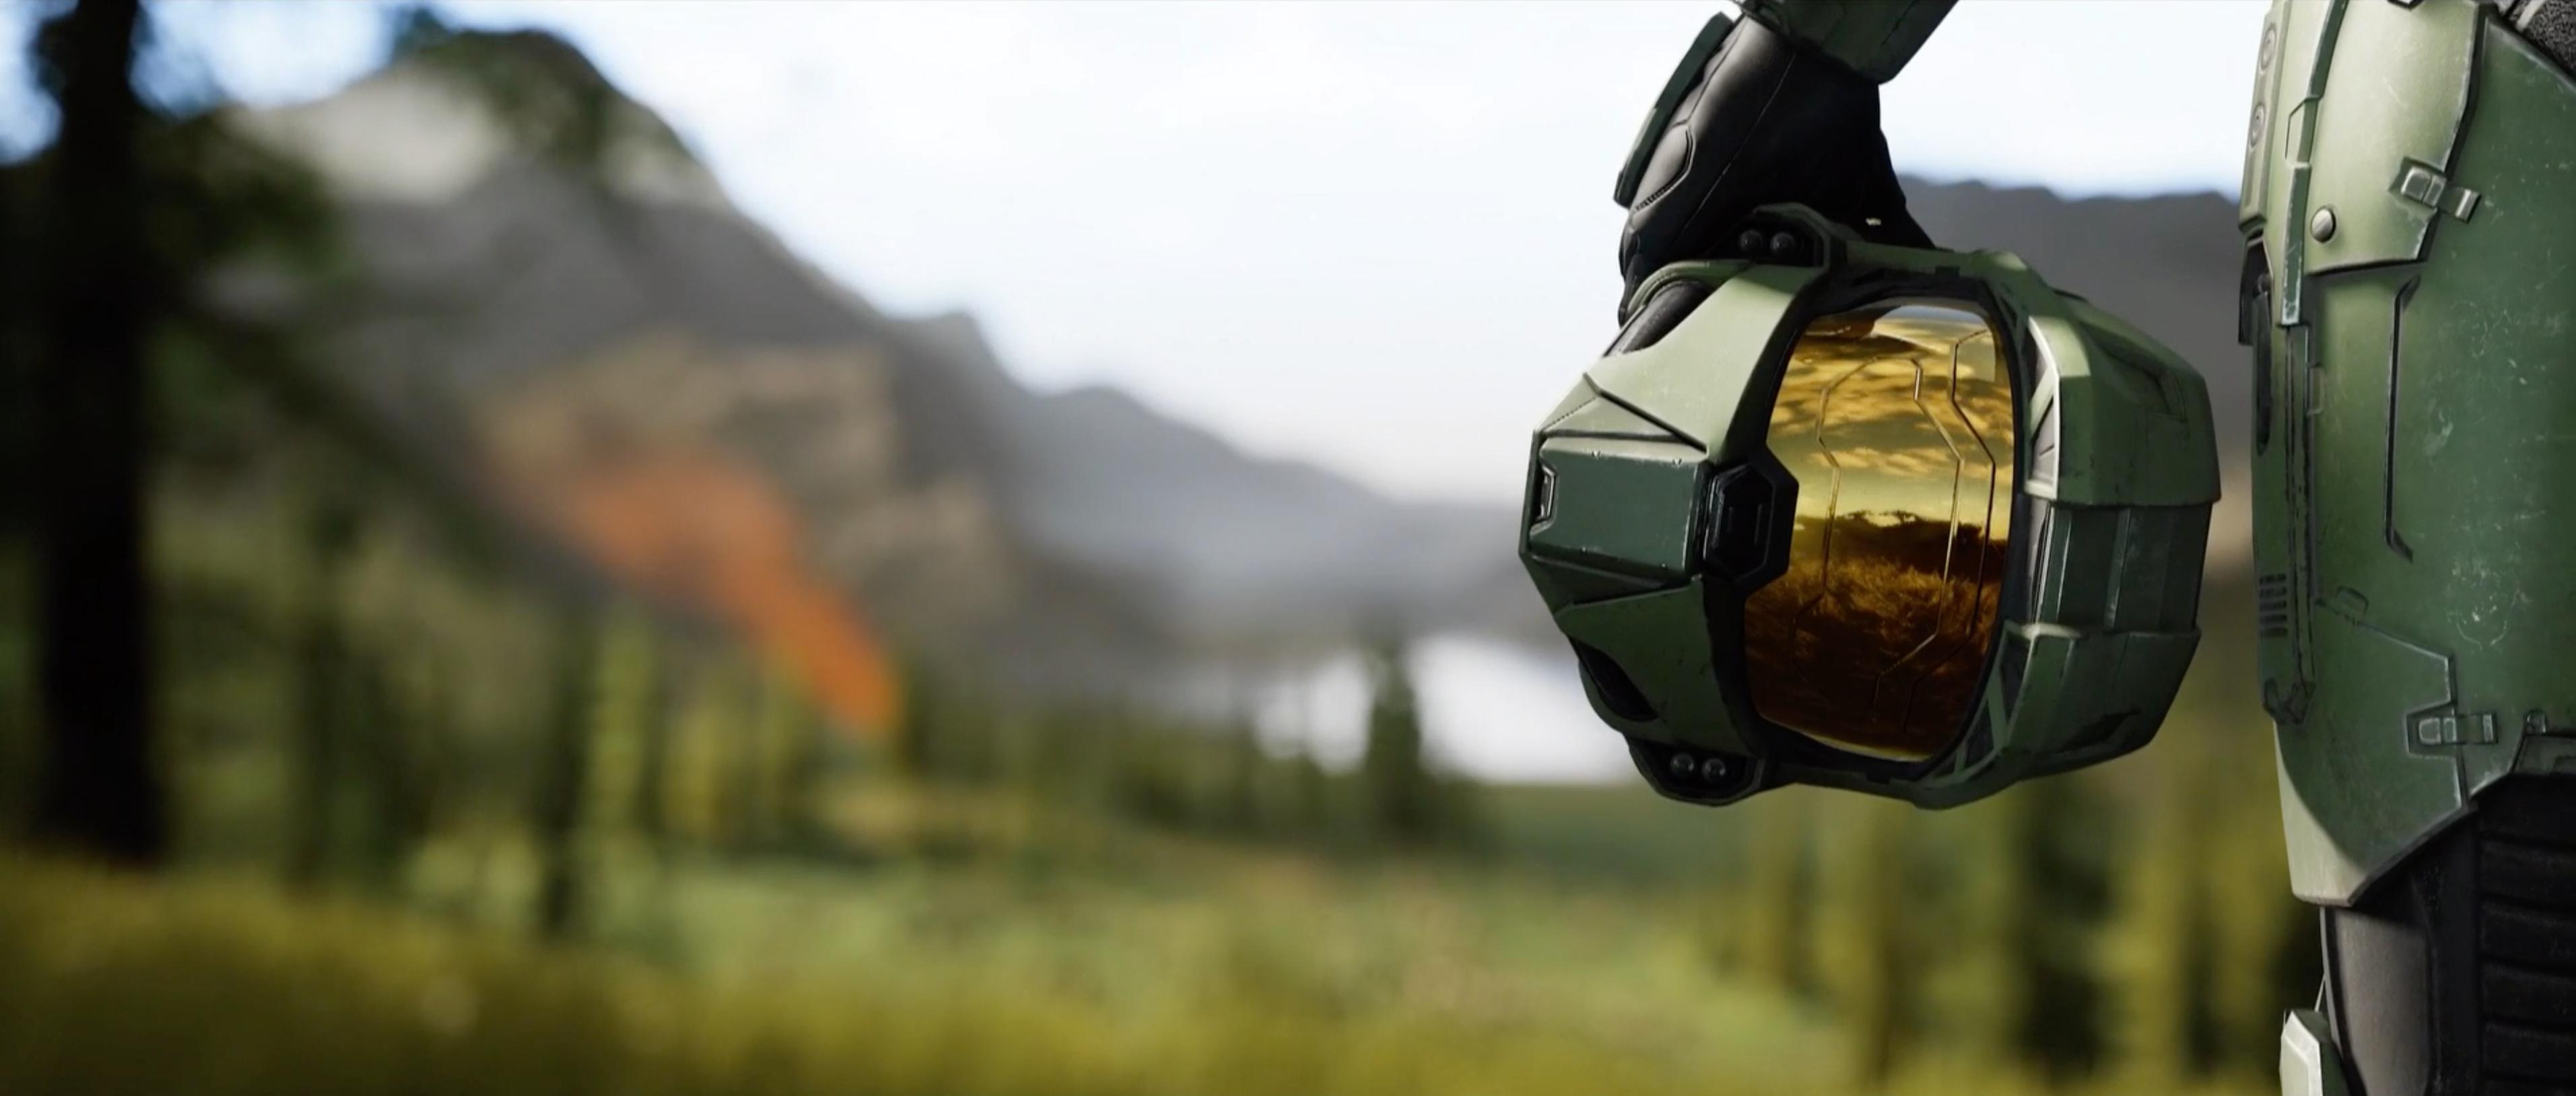 Microsoft Announces Halo Infinite With Tiny Teaser